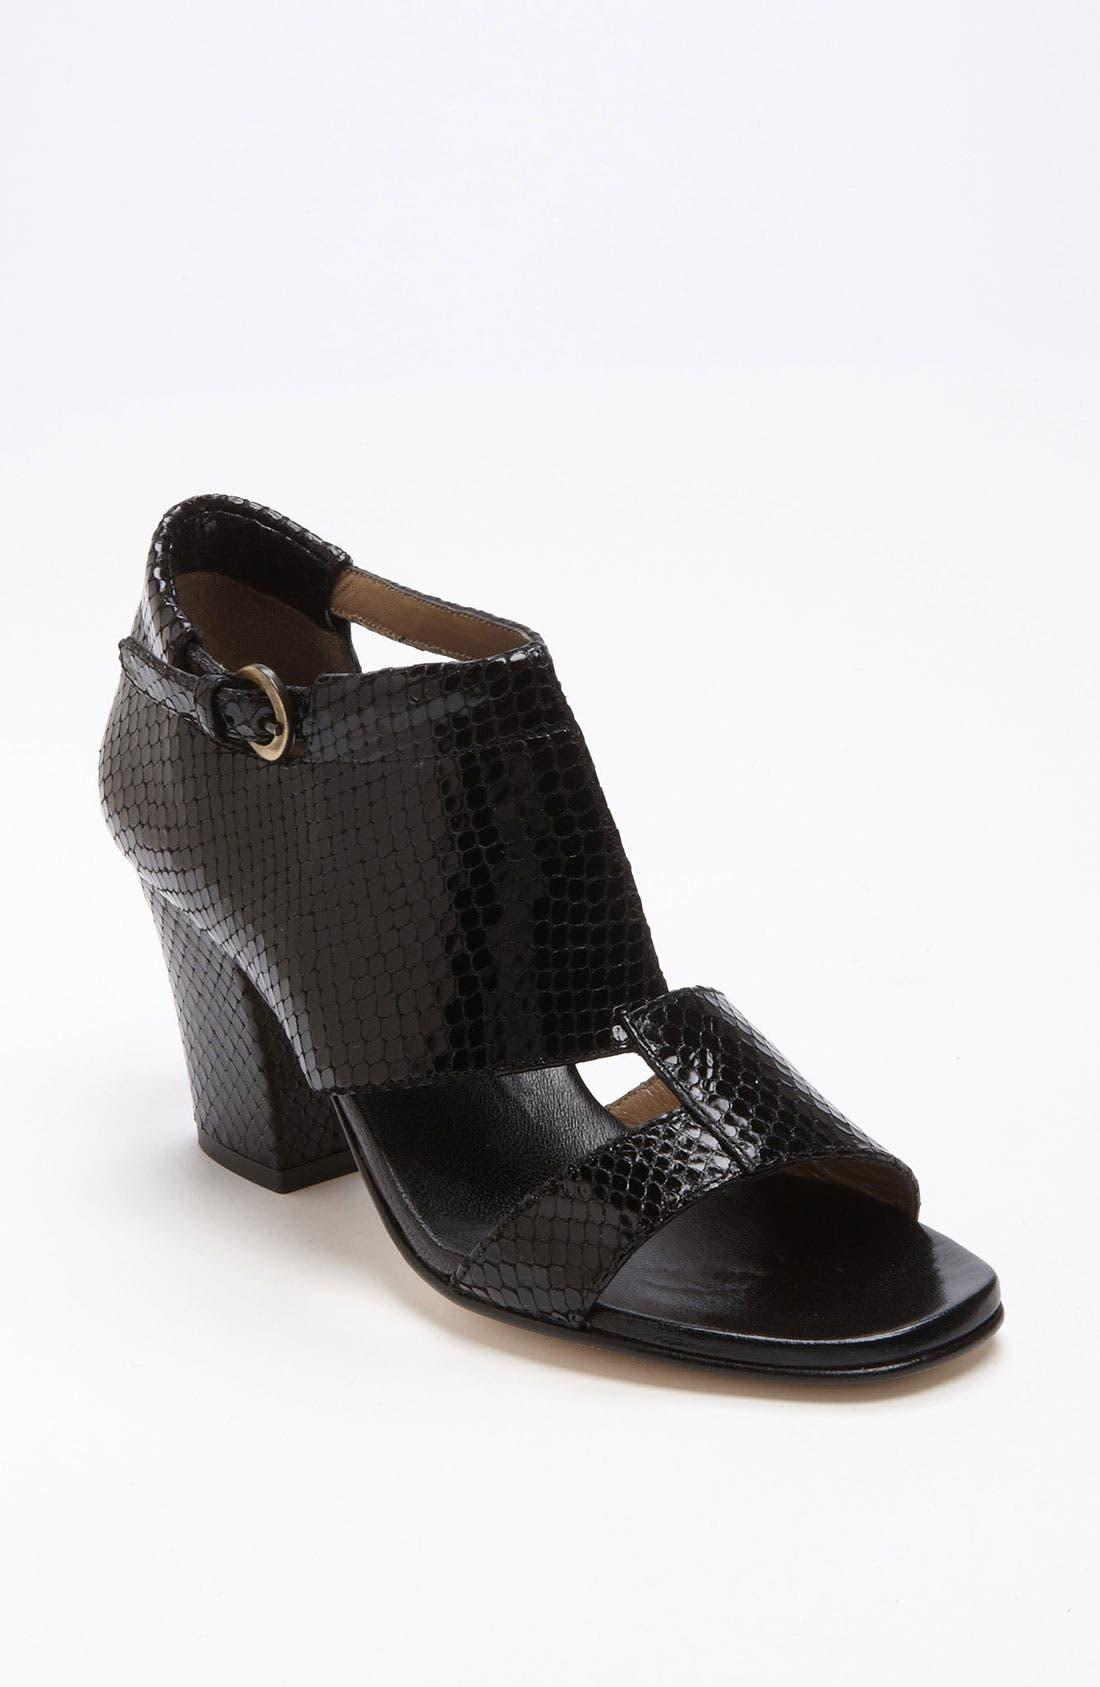 Alternate Image 1 Selected - Anyi Lu 'Electra' Sandal